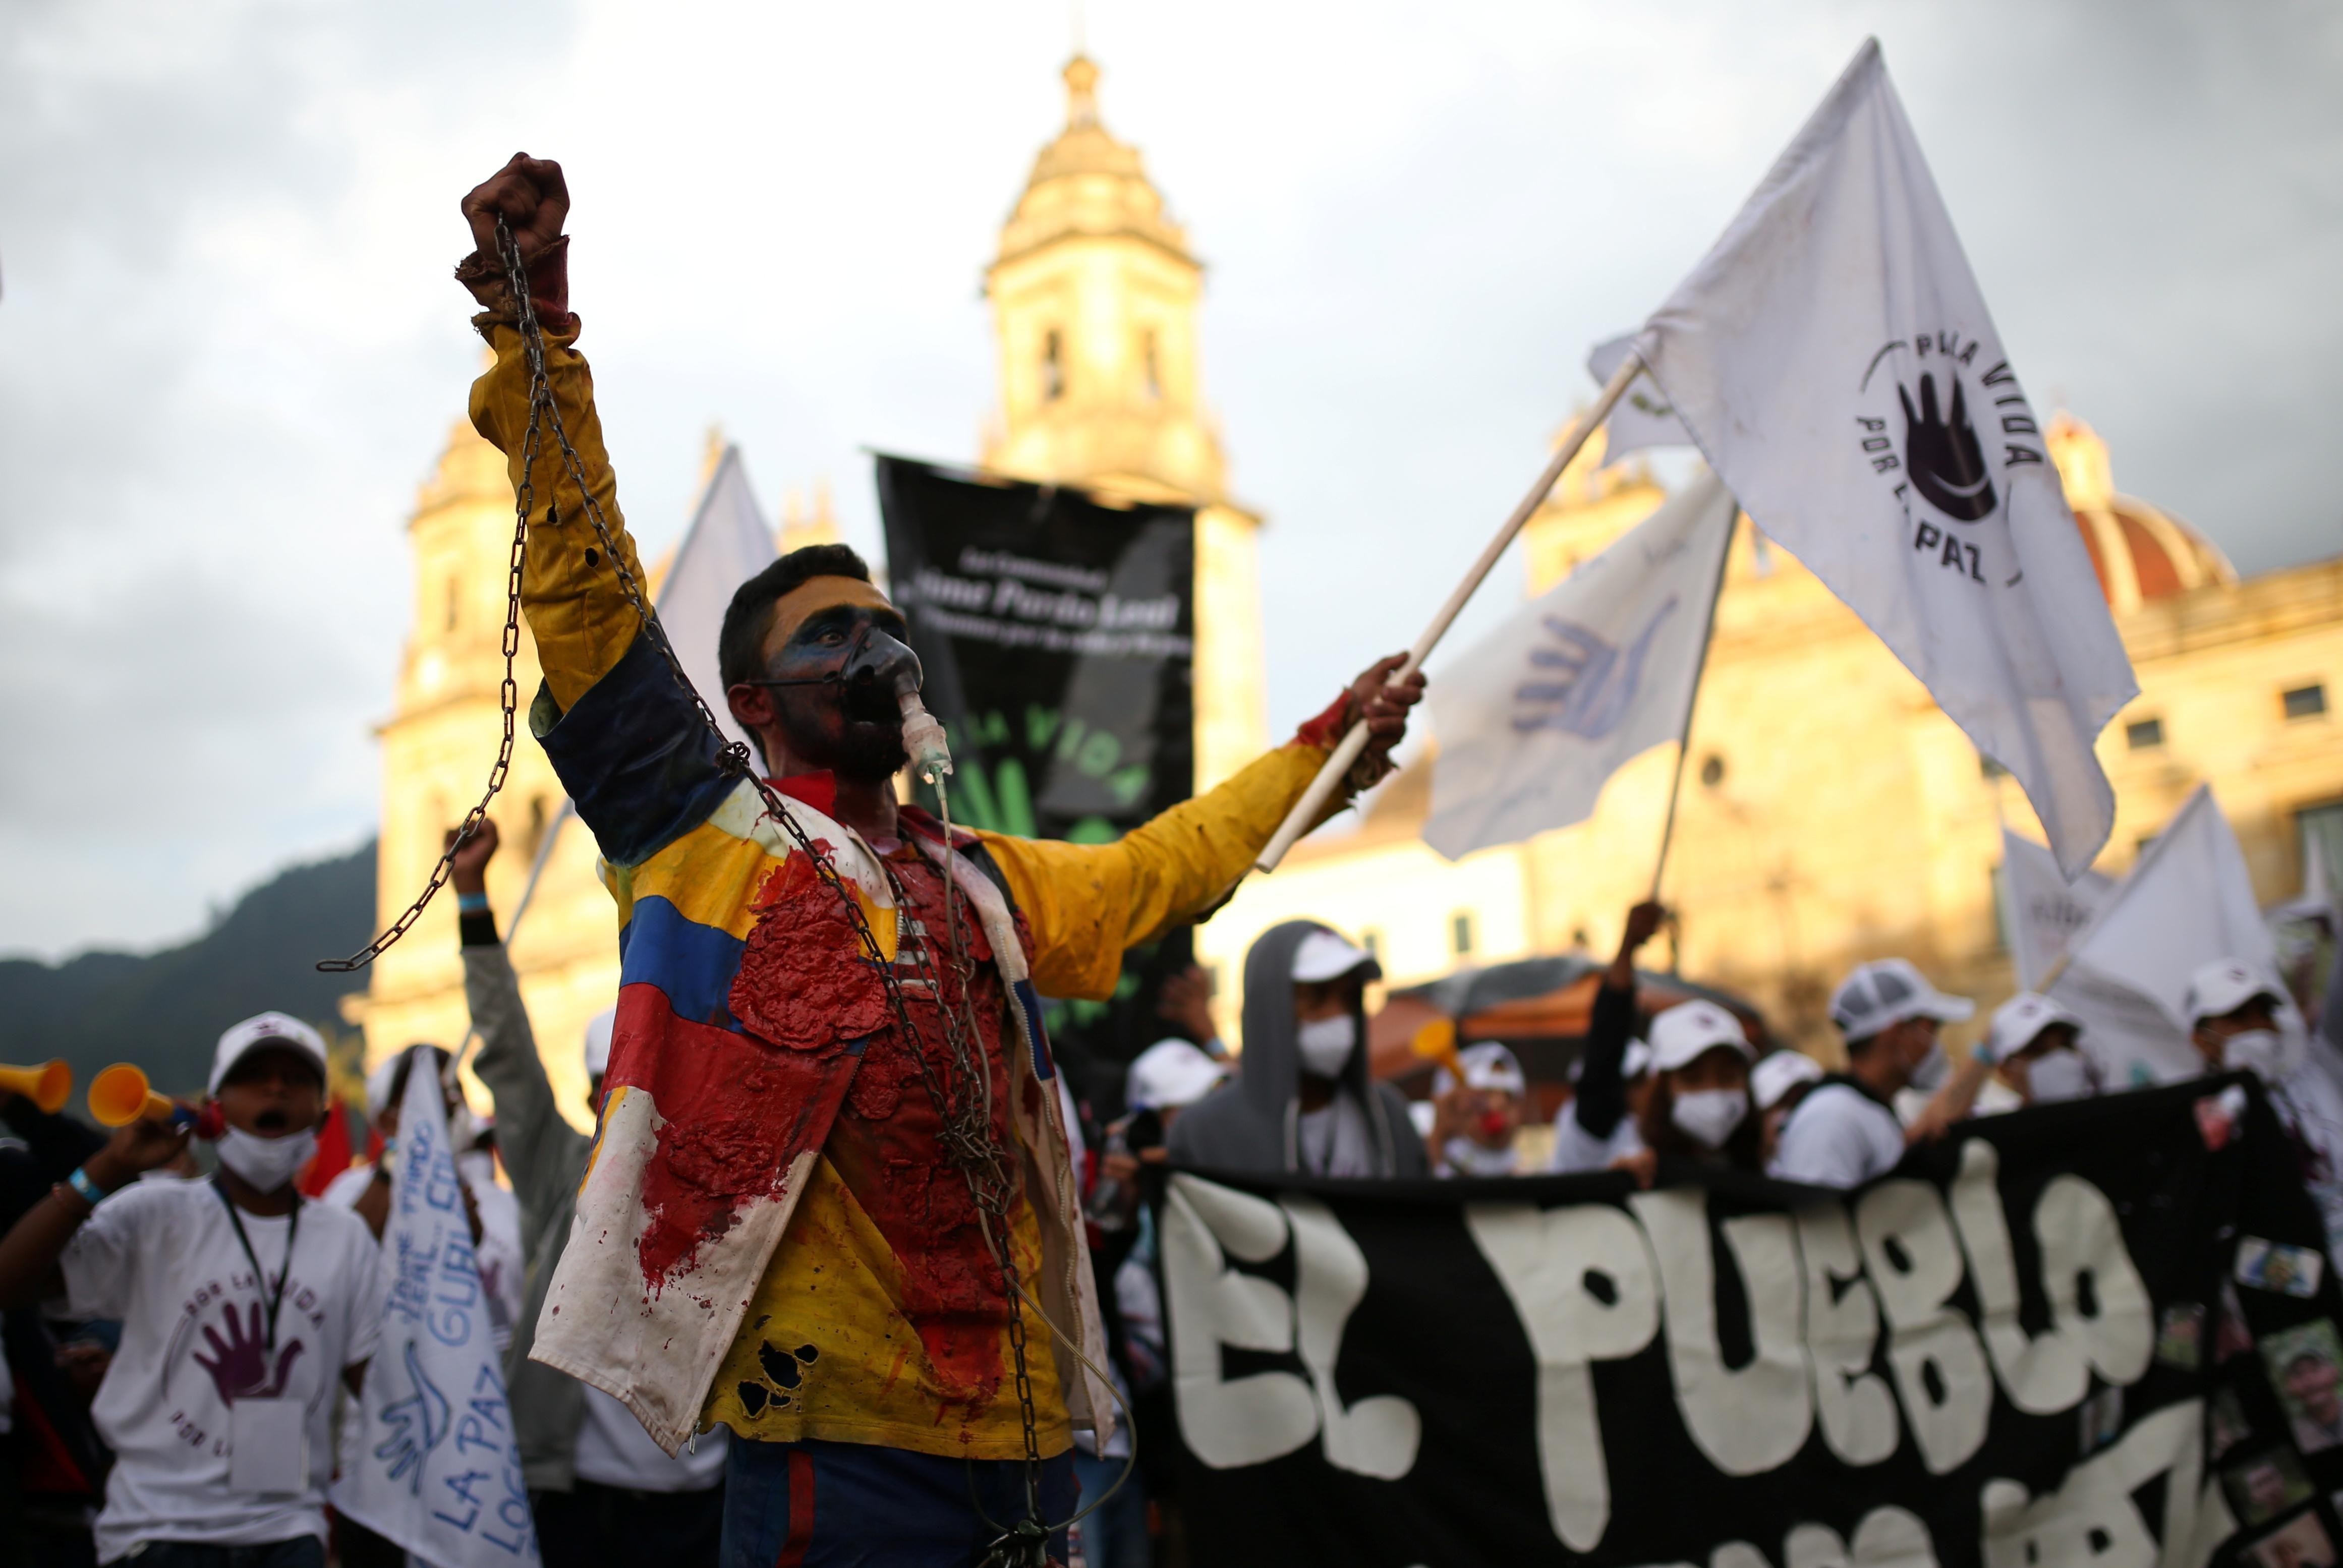 Former FARC guerrillas protest in Bogota, Colombia. Reuters